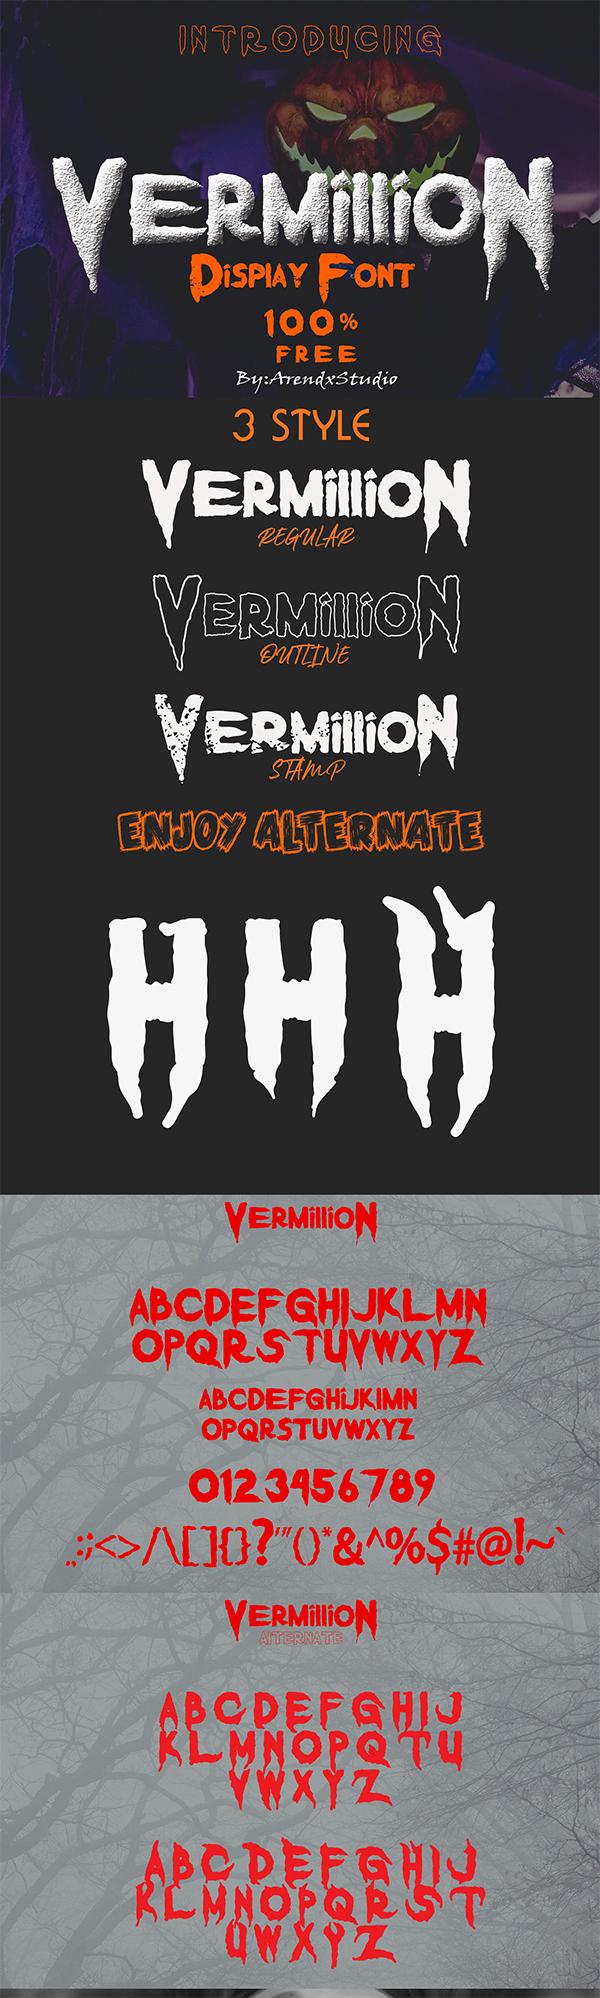 Vermillion Display Free Font